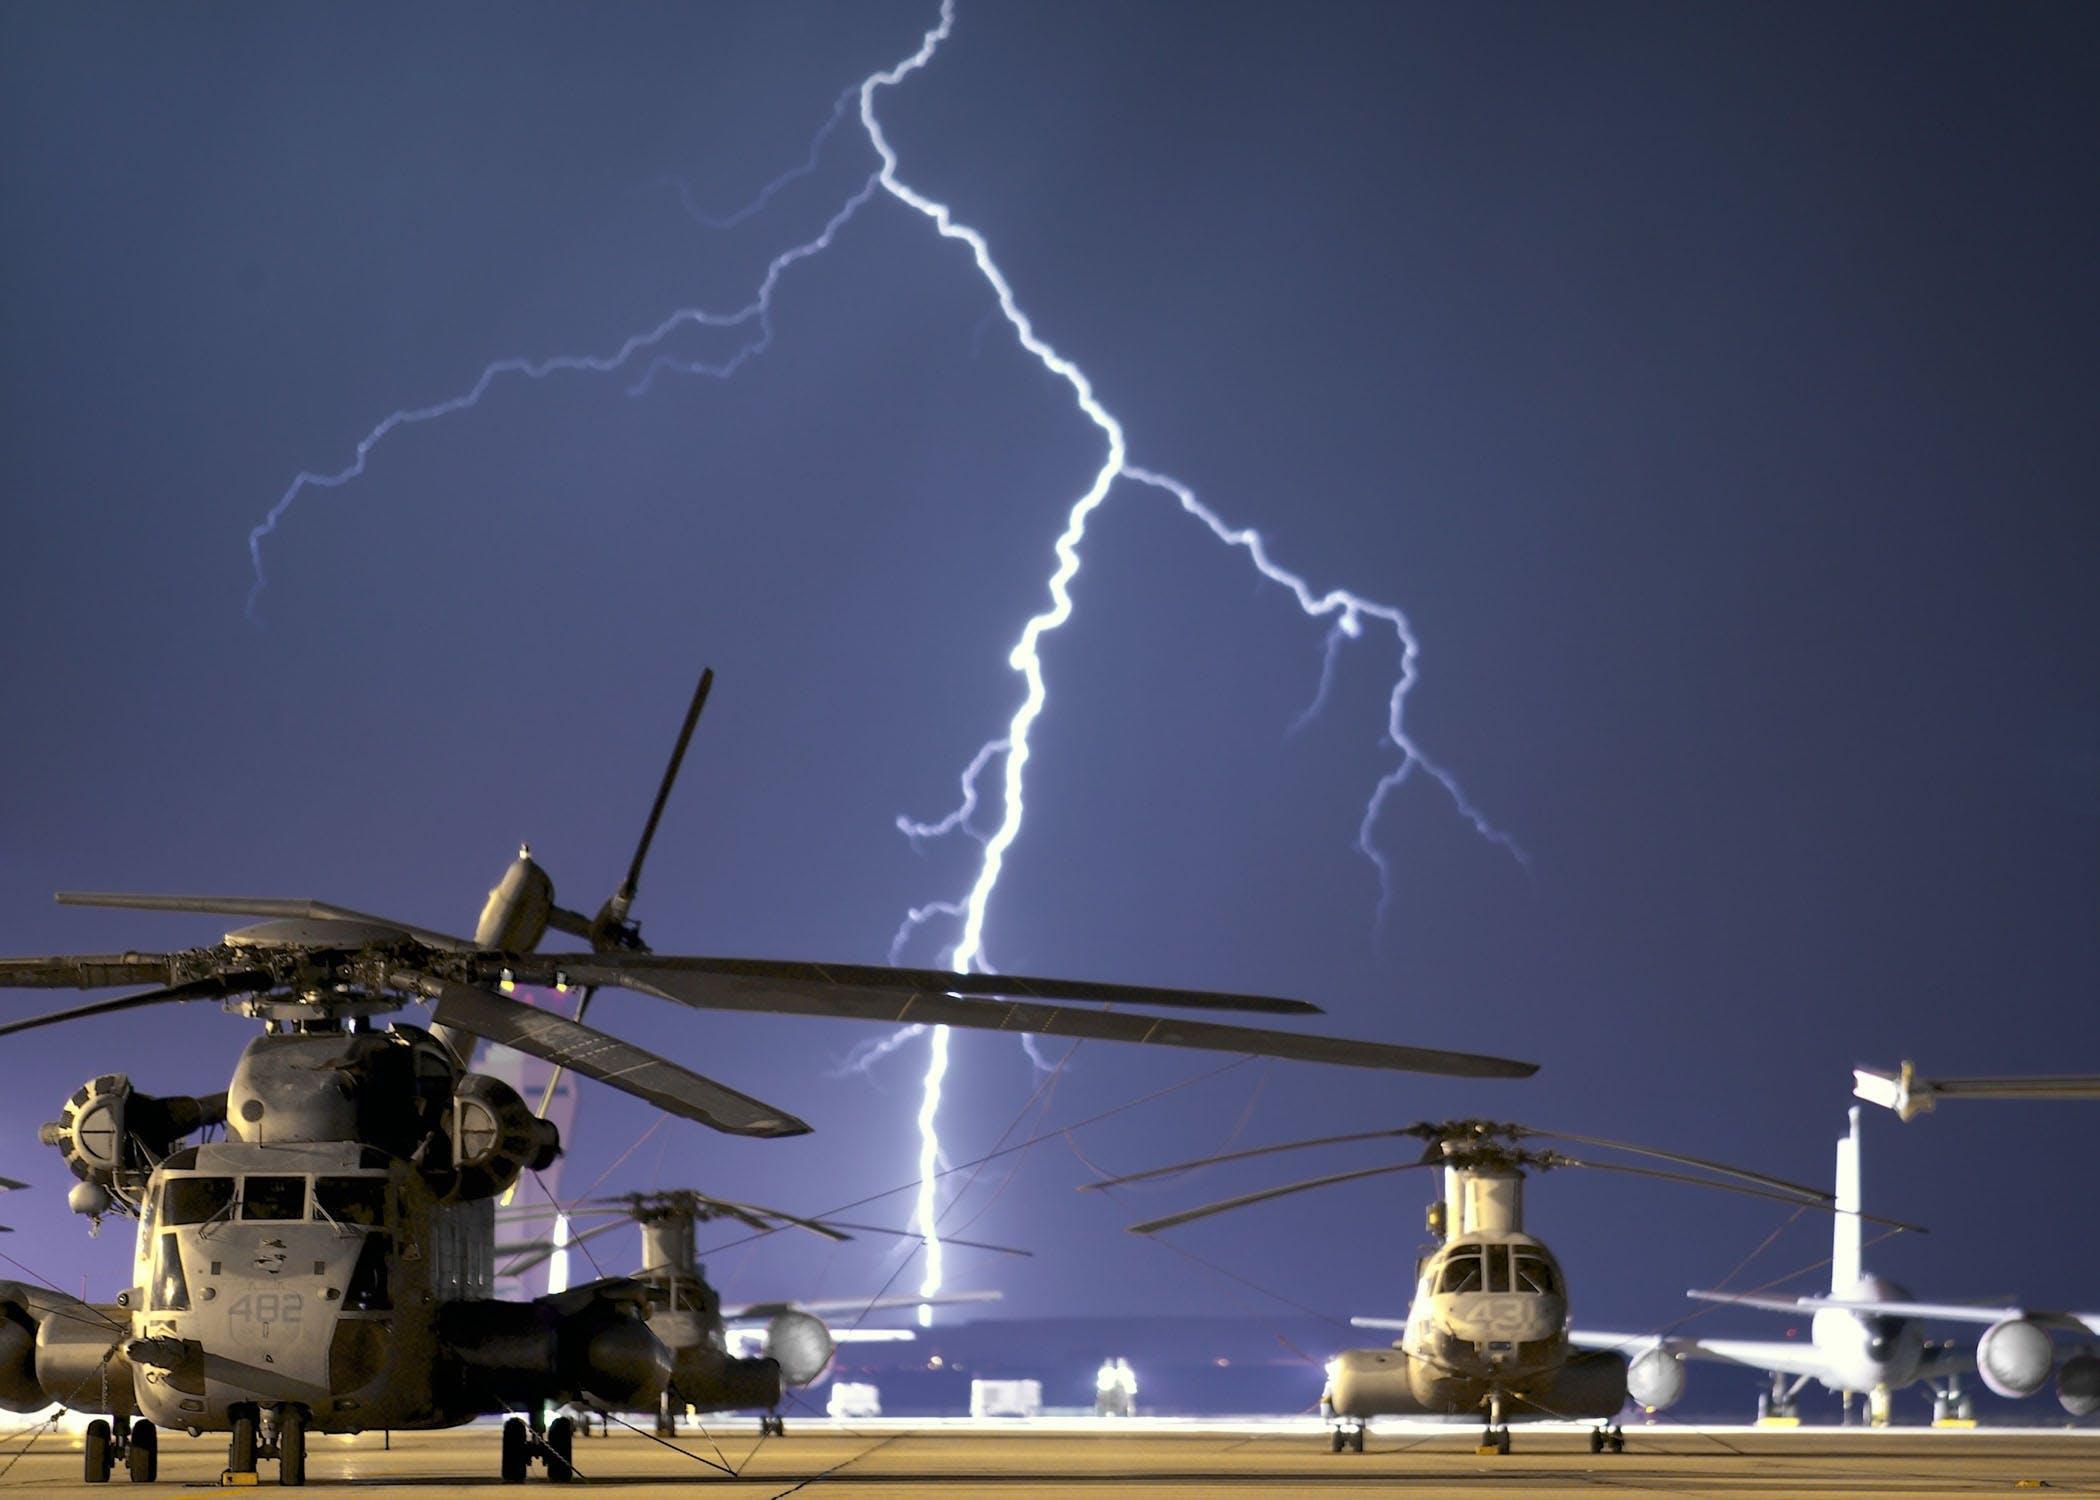 Lightning Near Grey Helicopter during Daytime